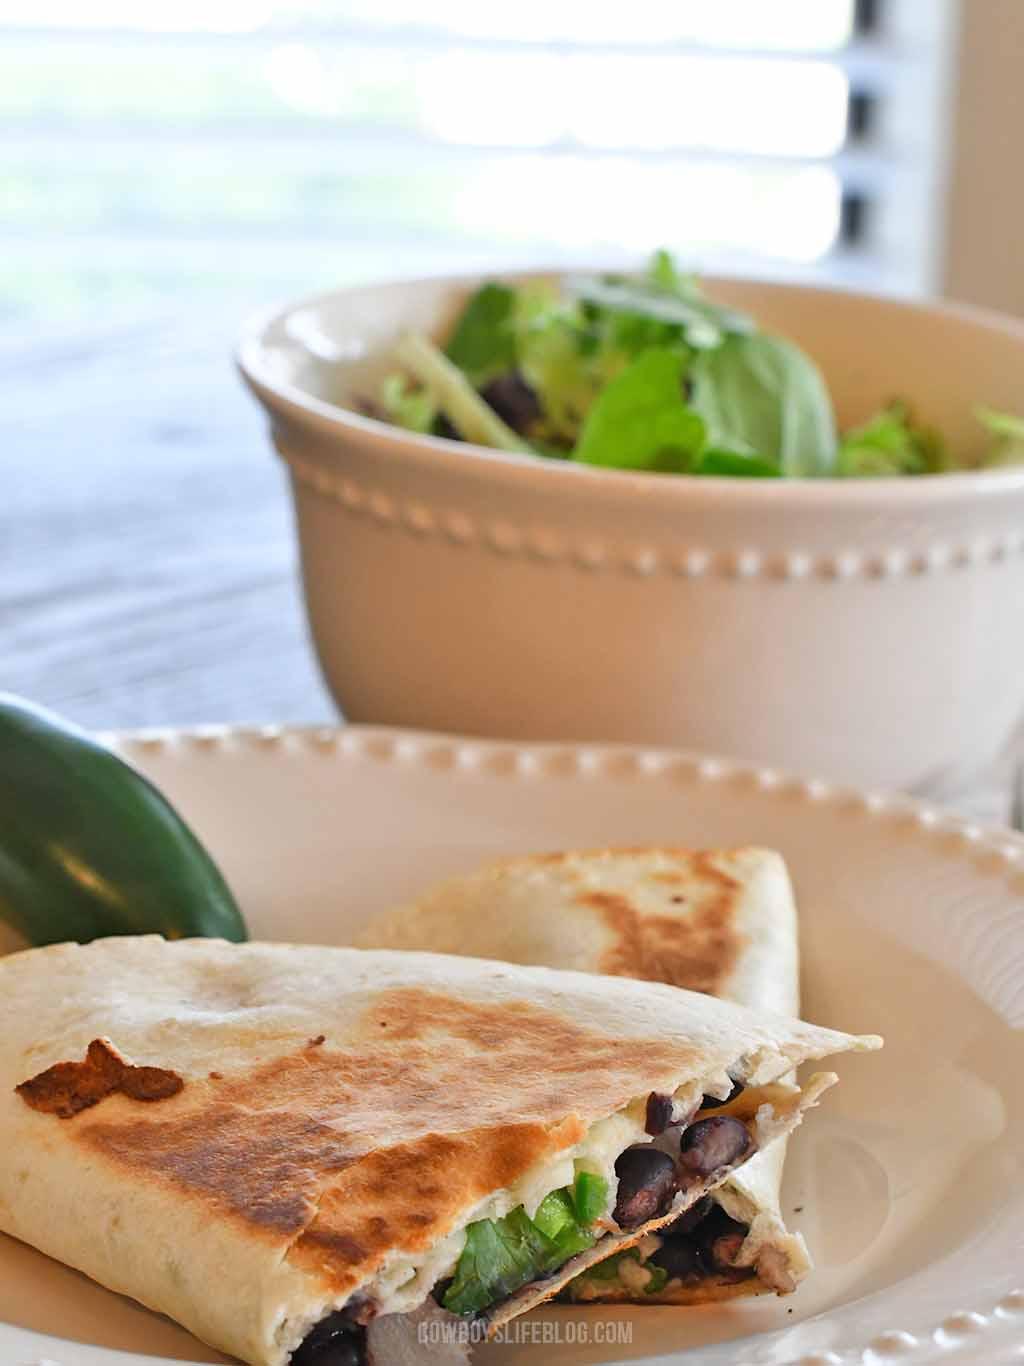 How to make black bean quesadillas